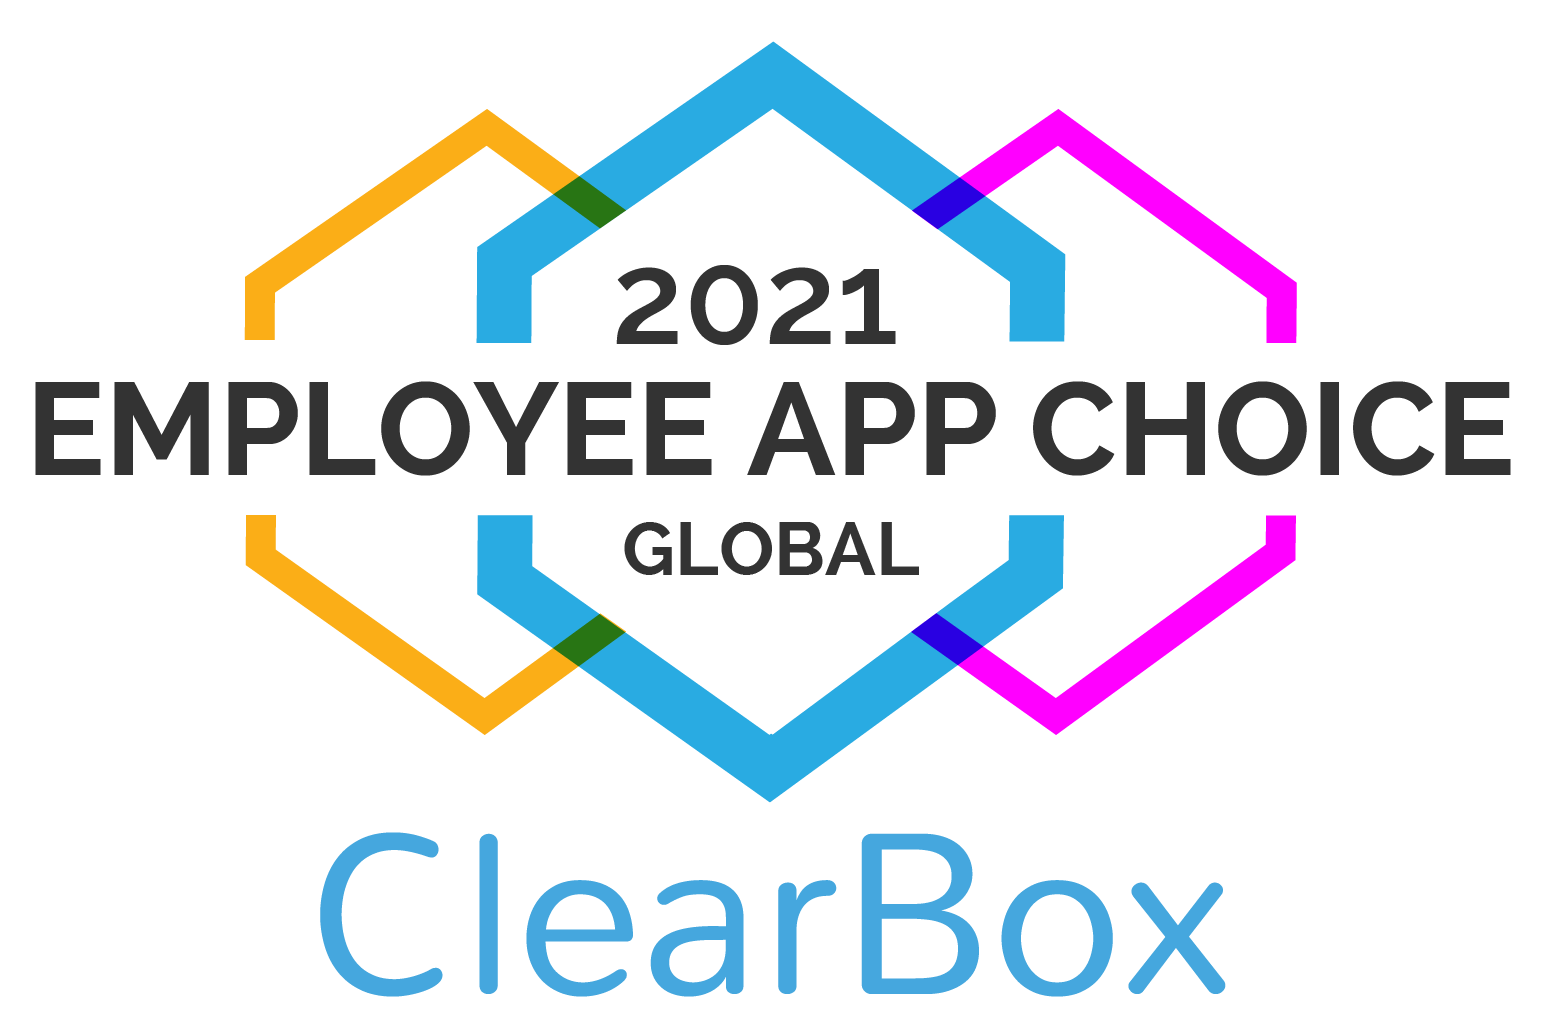 Employee app choice Global 2021.